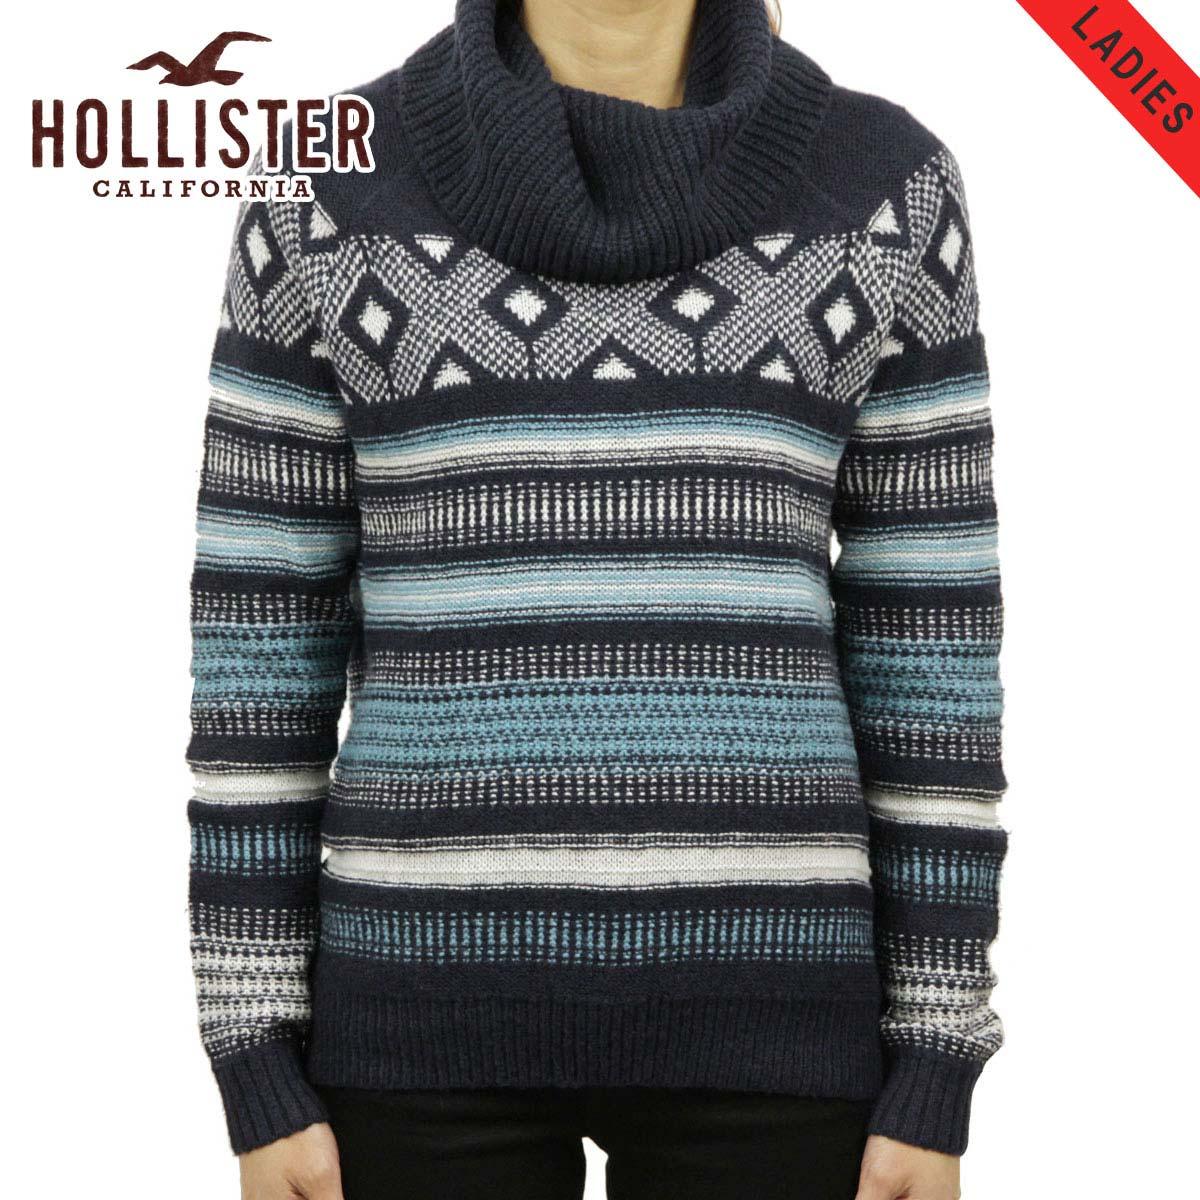 1e1e78b6302b Hollister HOLLISTER AE women s sweater Patterned Cowl Neck Sweater  350-507-0558-206